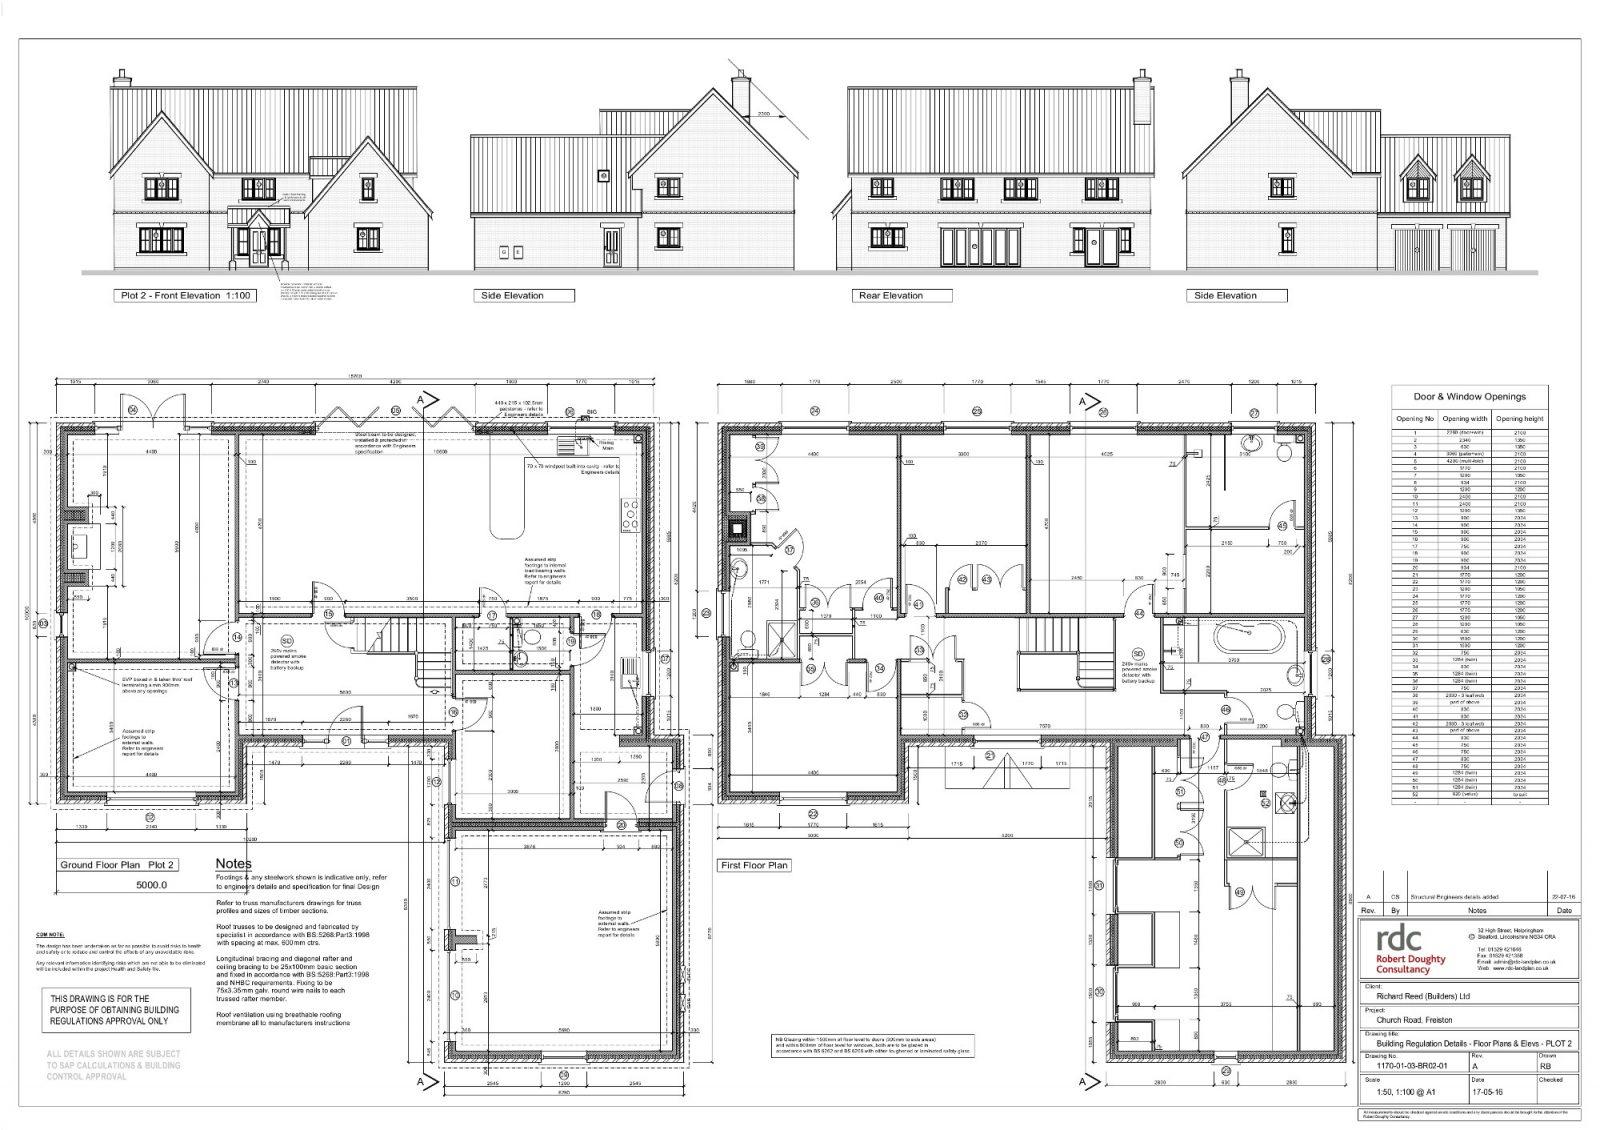 plot 2 floor plans and elavations